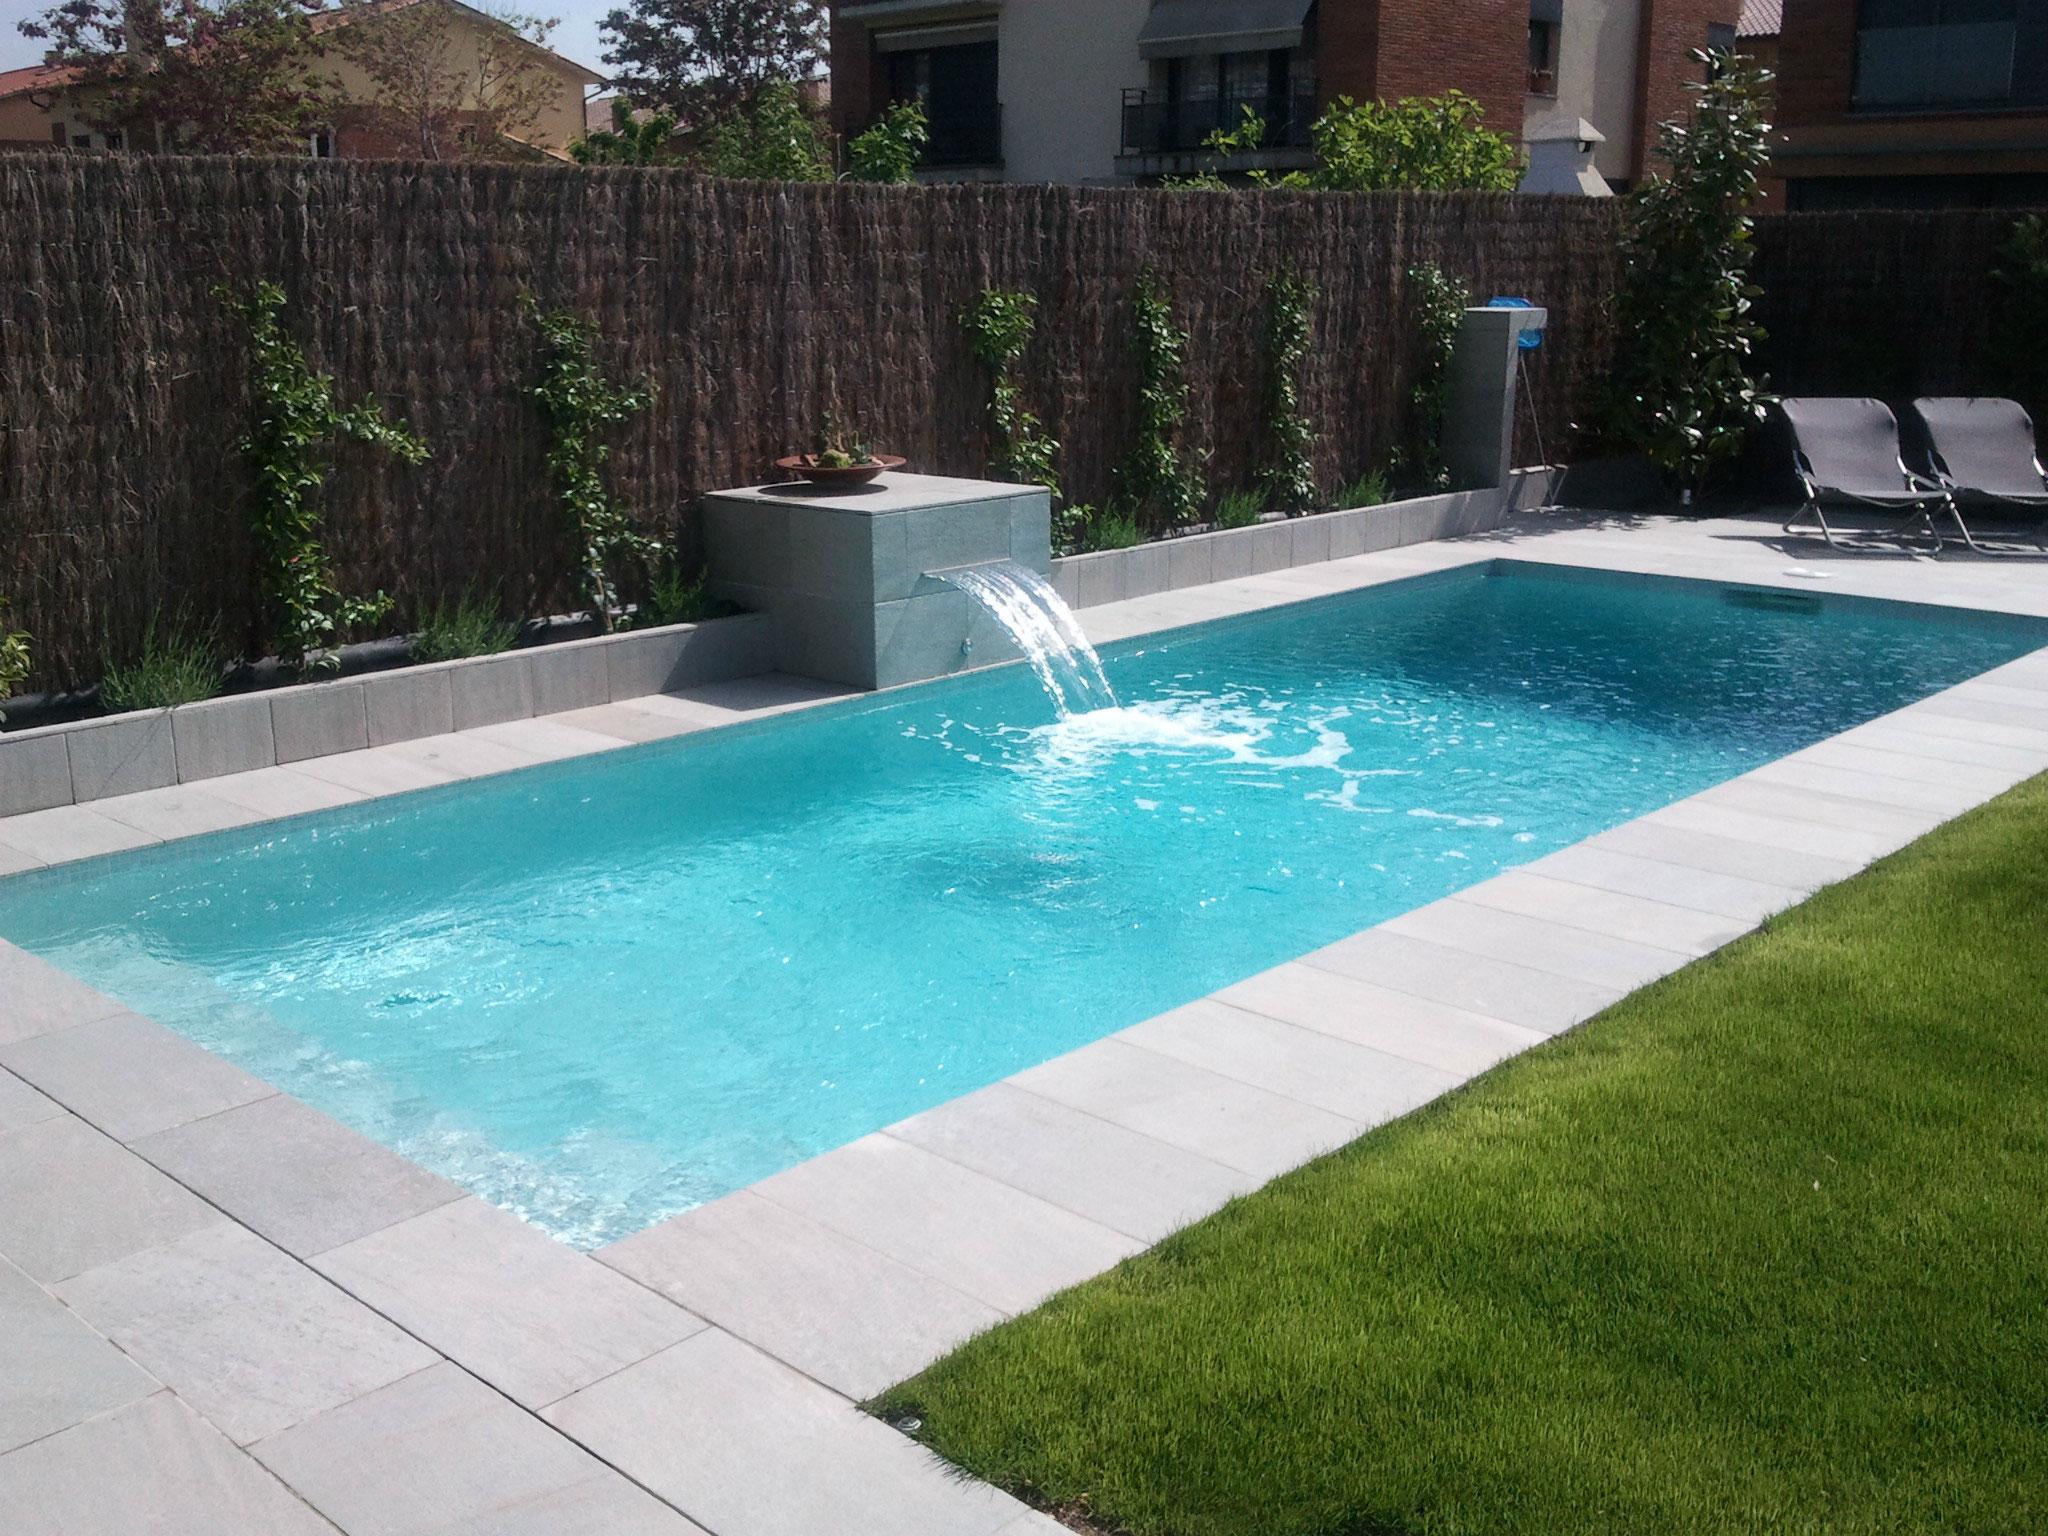 Piscinas barcelona piscinas unic construcci n de piscinas en barcelona - Construccion piscinas barcelona ...